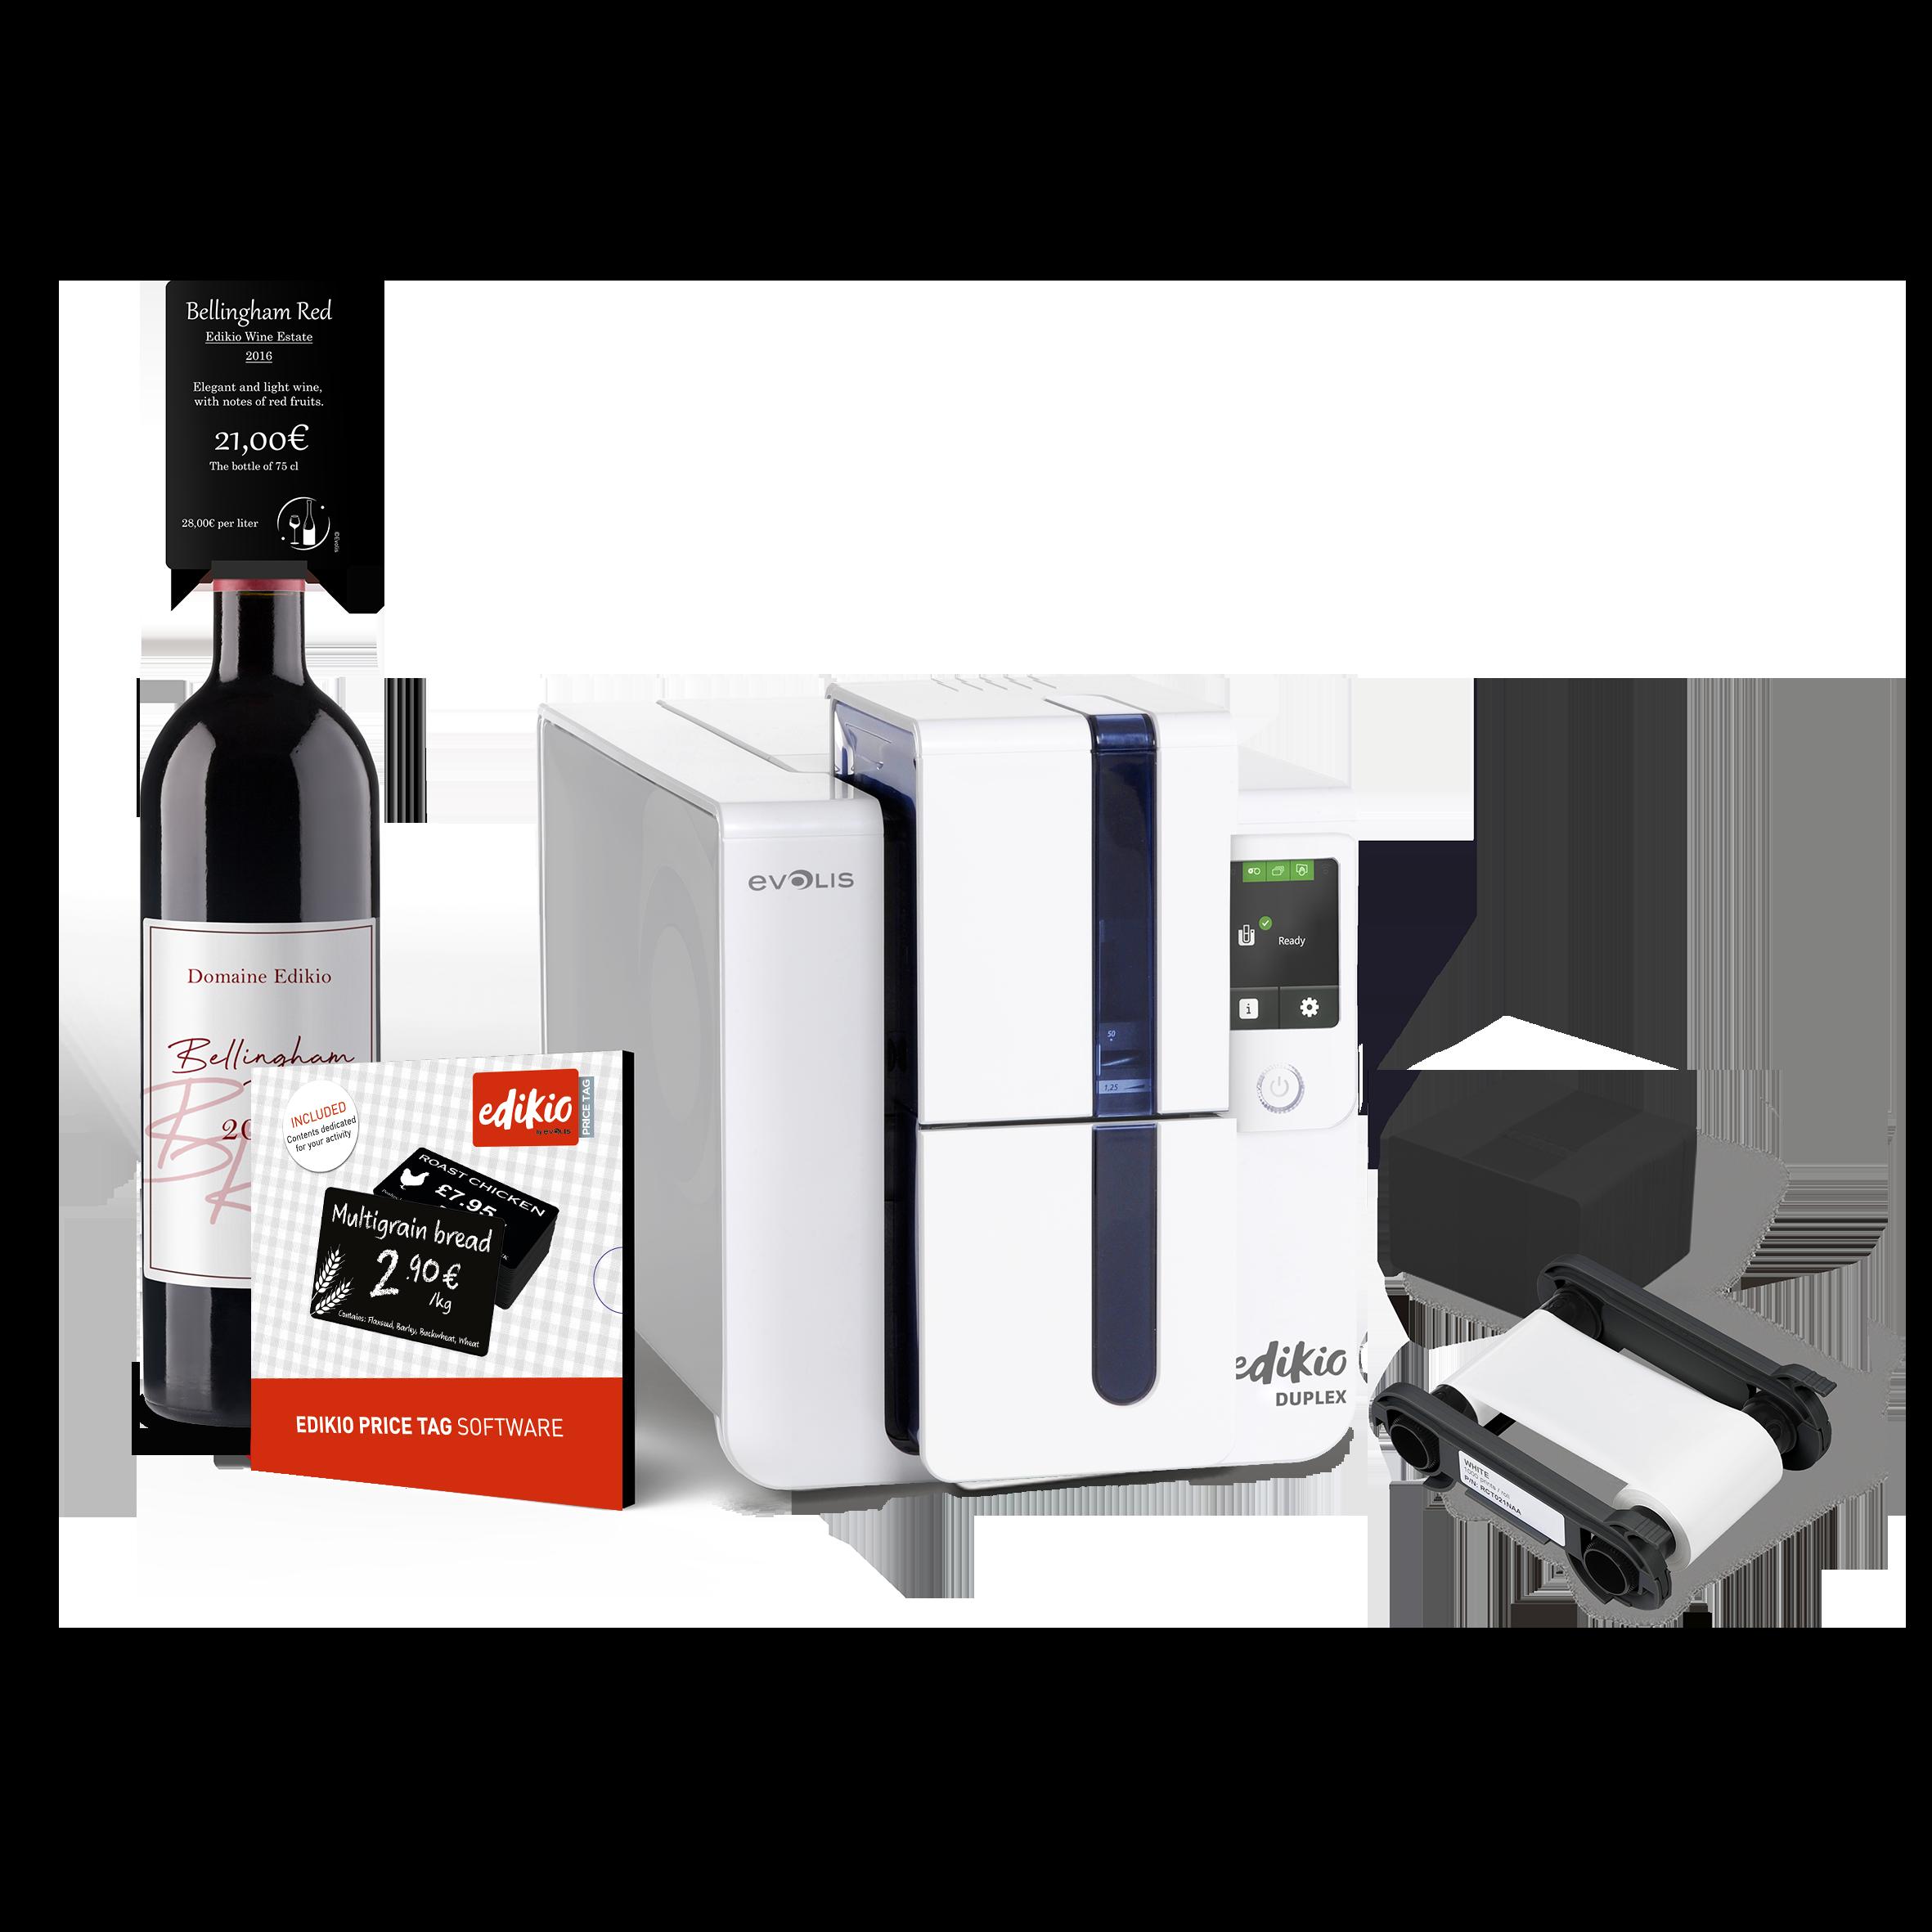 wine-solution-edk